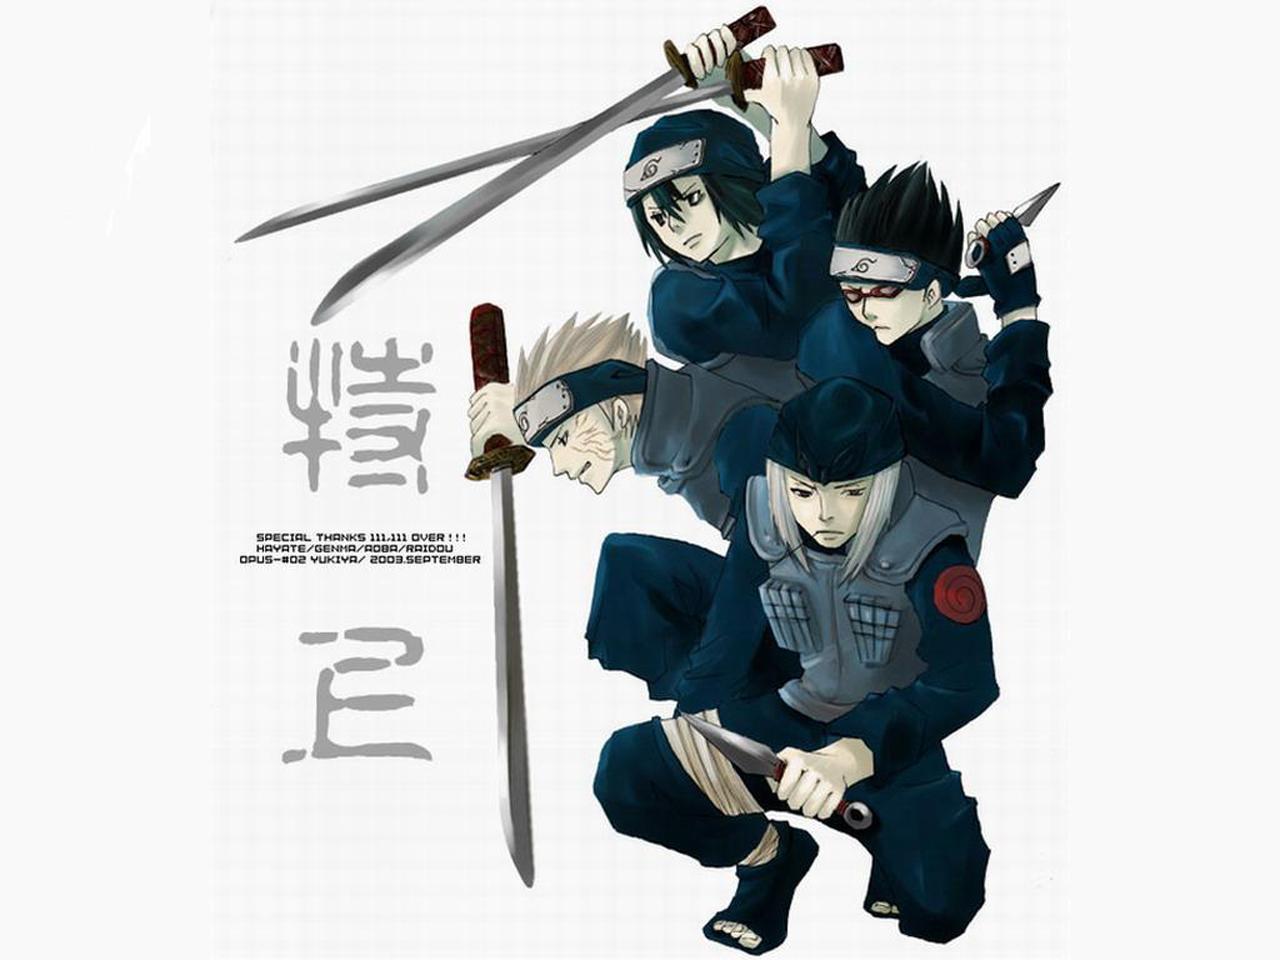 http://3.bp.blogspot.com/_wgjq0bIUQV8/TBUTGjbJG3I/AAAAAAAAA5w/g7cS16jAlr4/s1600/Naruto-Group-Wallpaper38.jpg